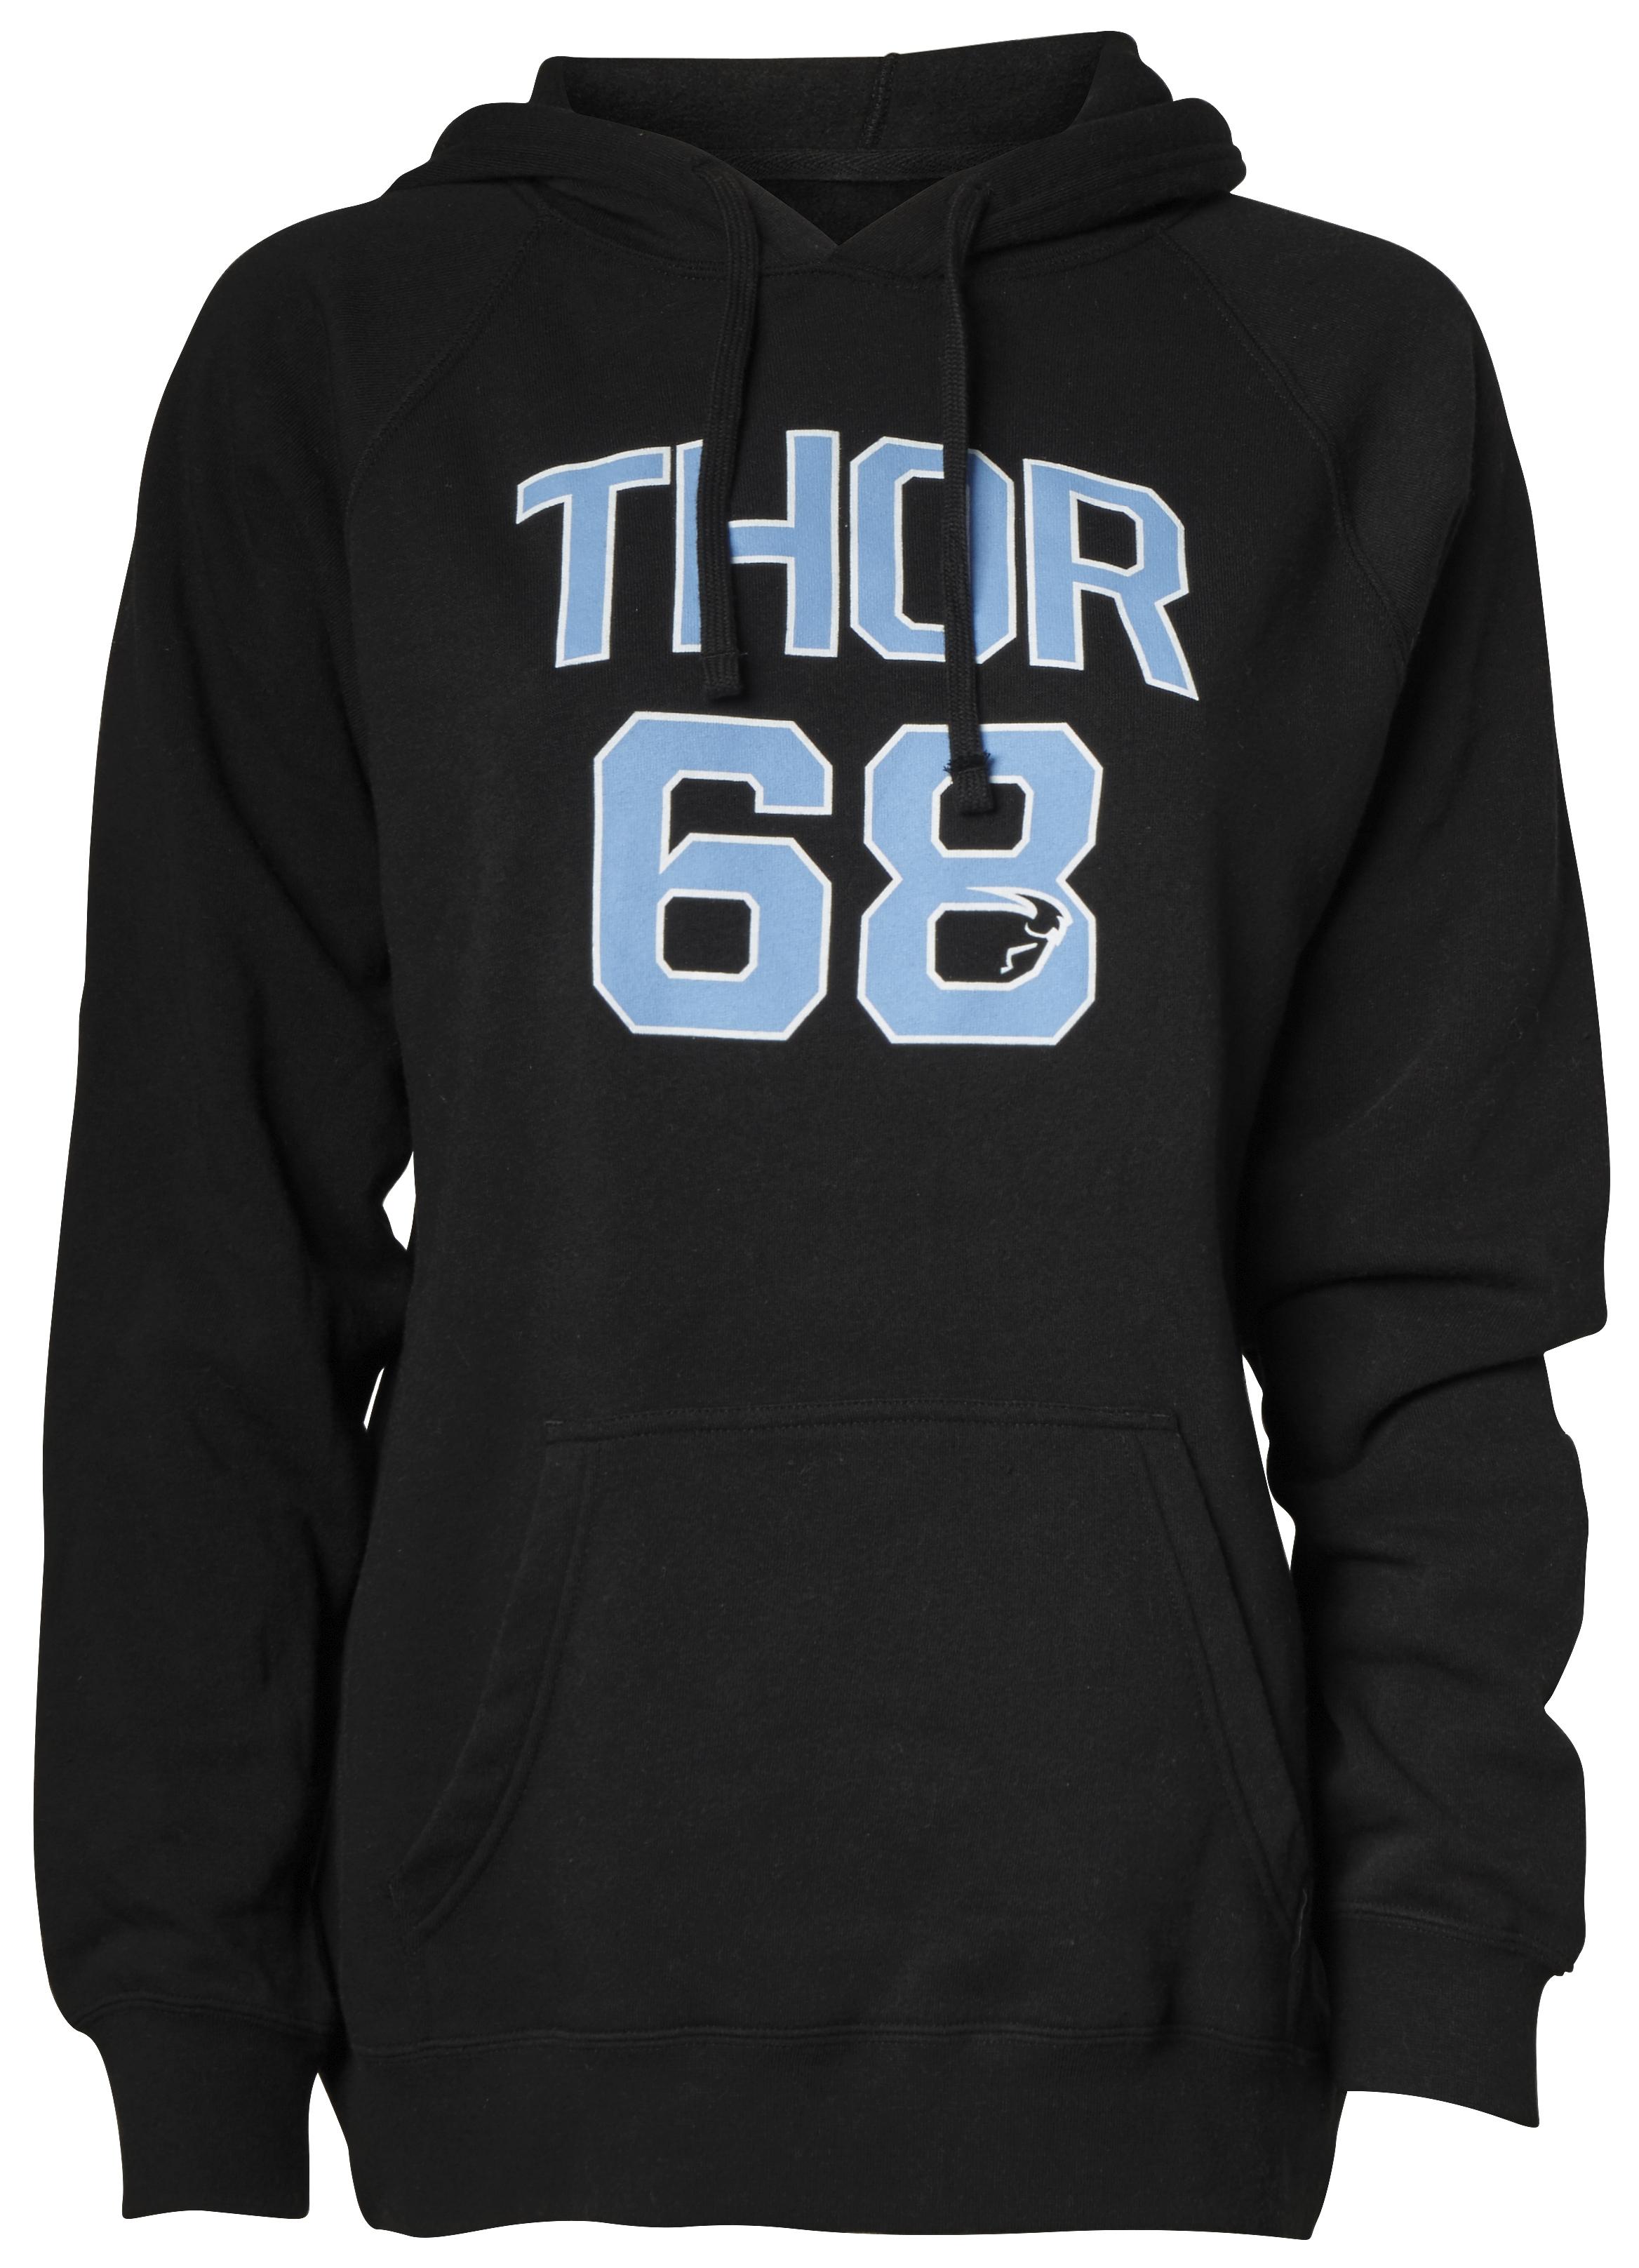 5d1ce9b4ff193 Thor Team Women s Hoody